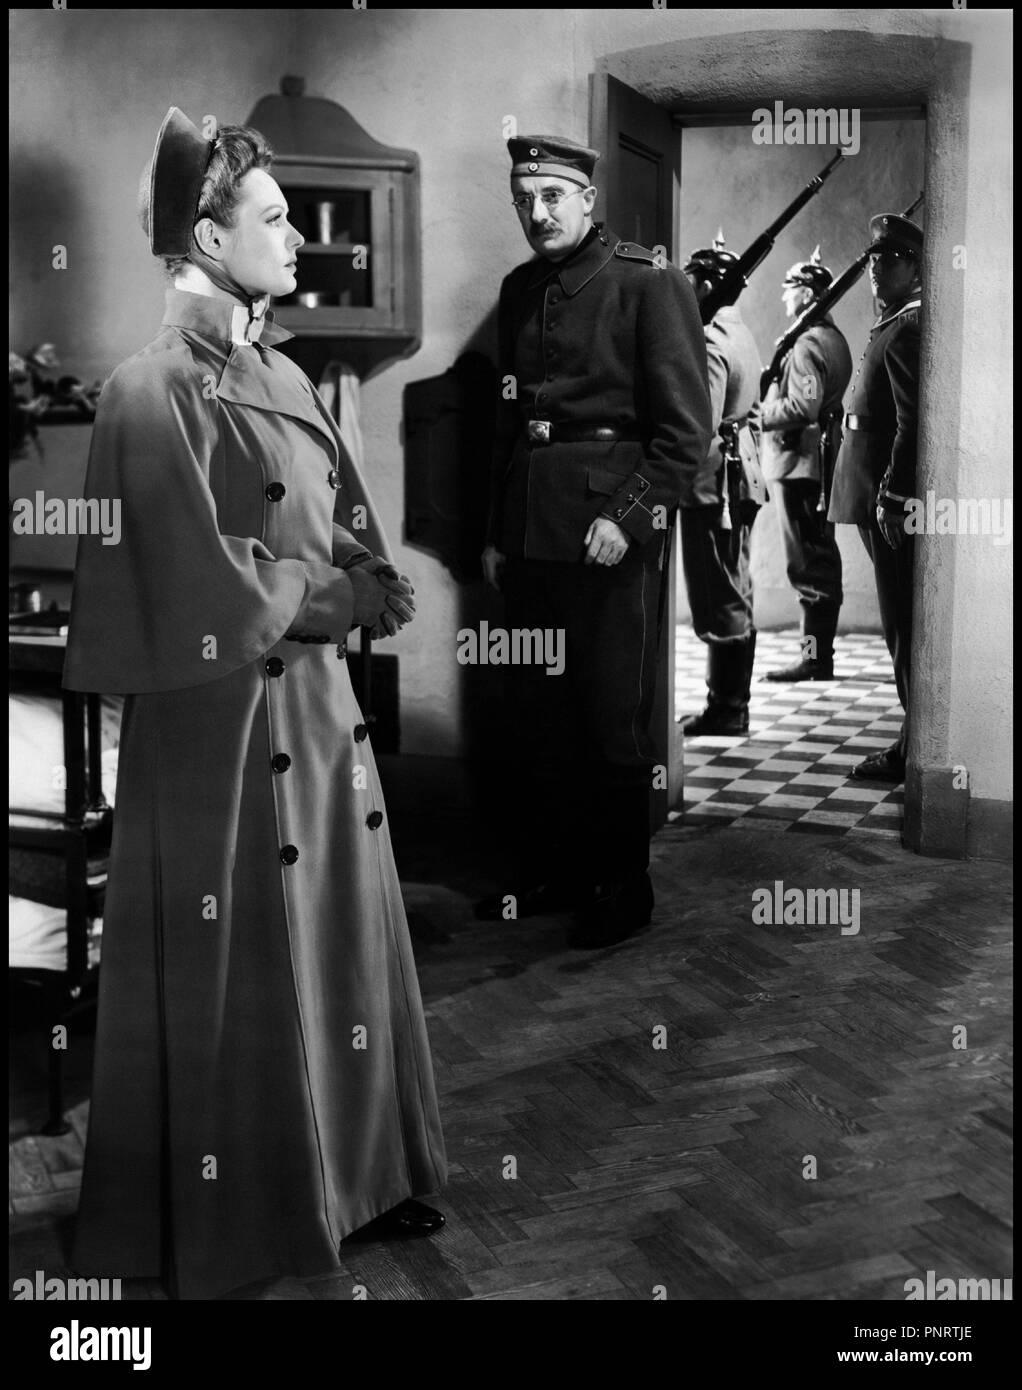 Prod DB © Imperadio / DR NURSE EDITH CAVELL (NURSE EDITH CAVELL) de Herbert Wilcox 1939 GB avec Anna Neagle d'apres l'autobiographie d'Edith Cavell - Stock Image